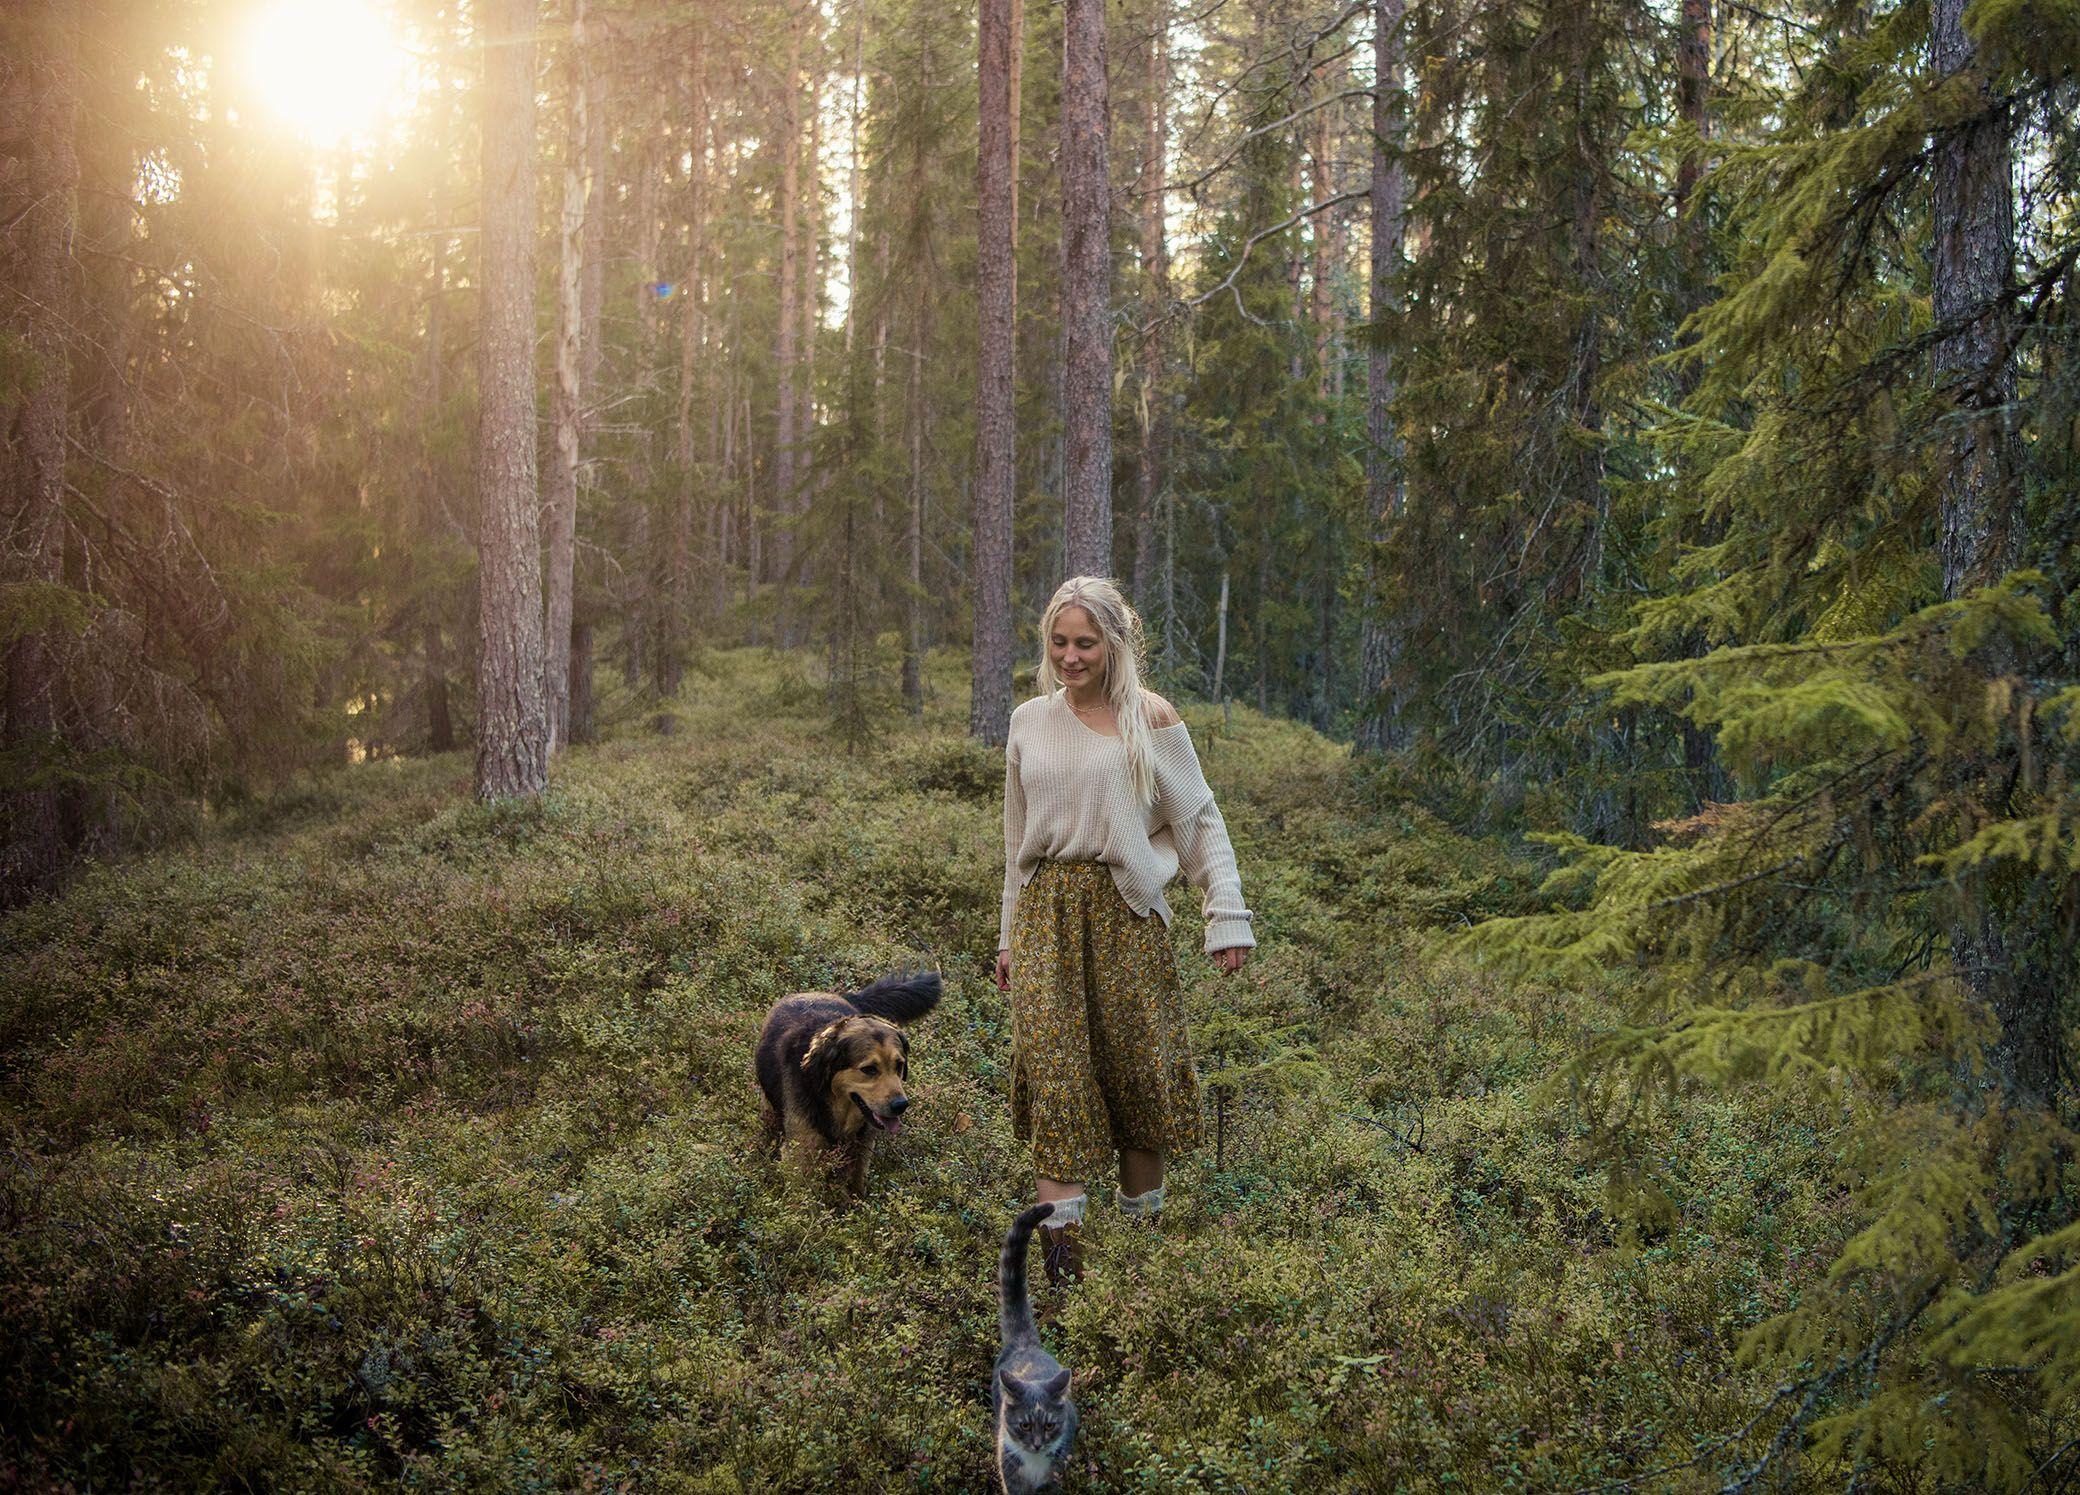 Sveriges bsta hngelstllen hr dejtar vi helst - Expressen